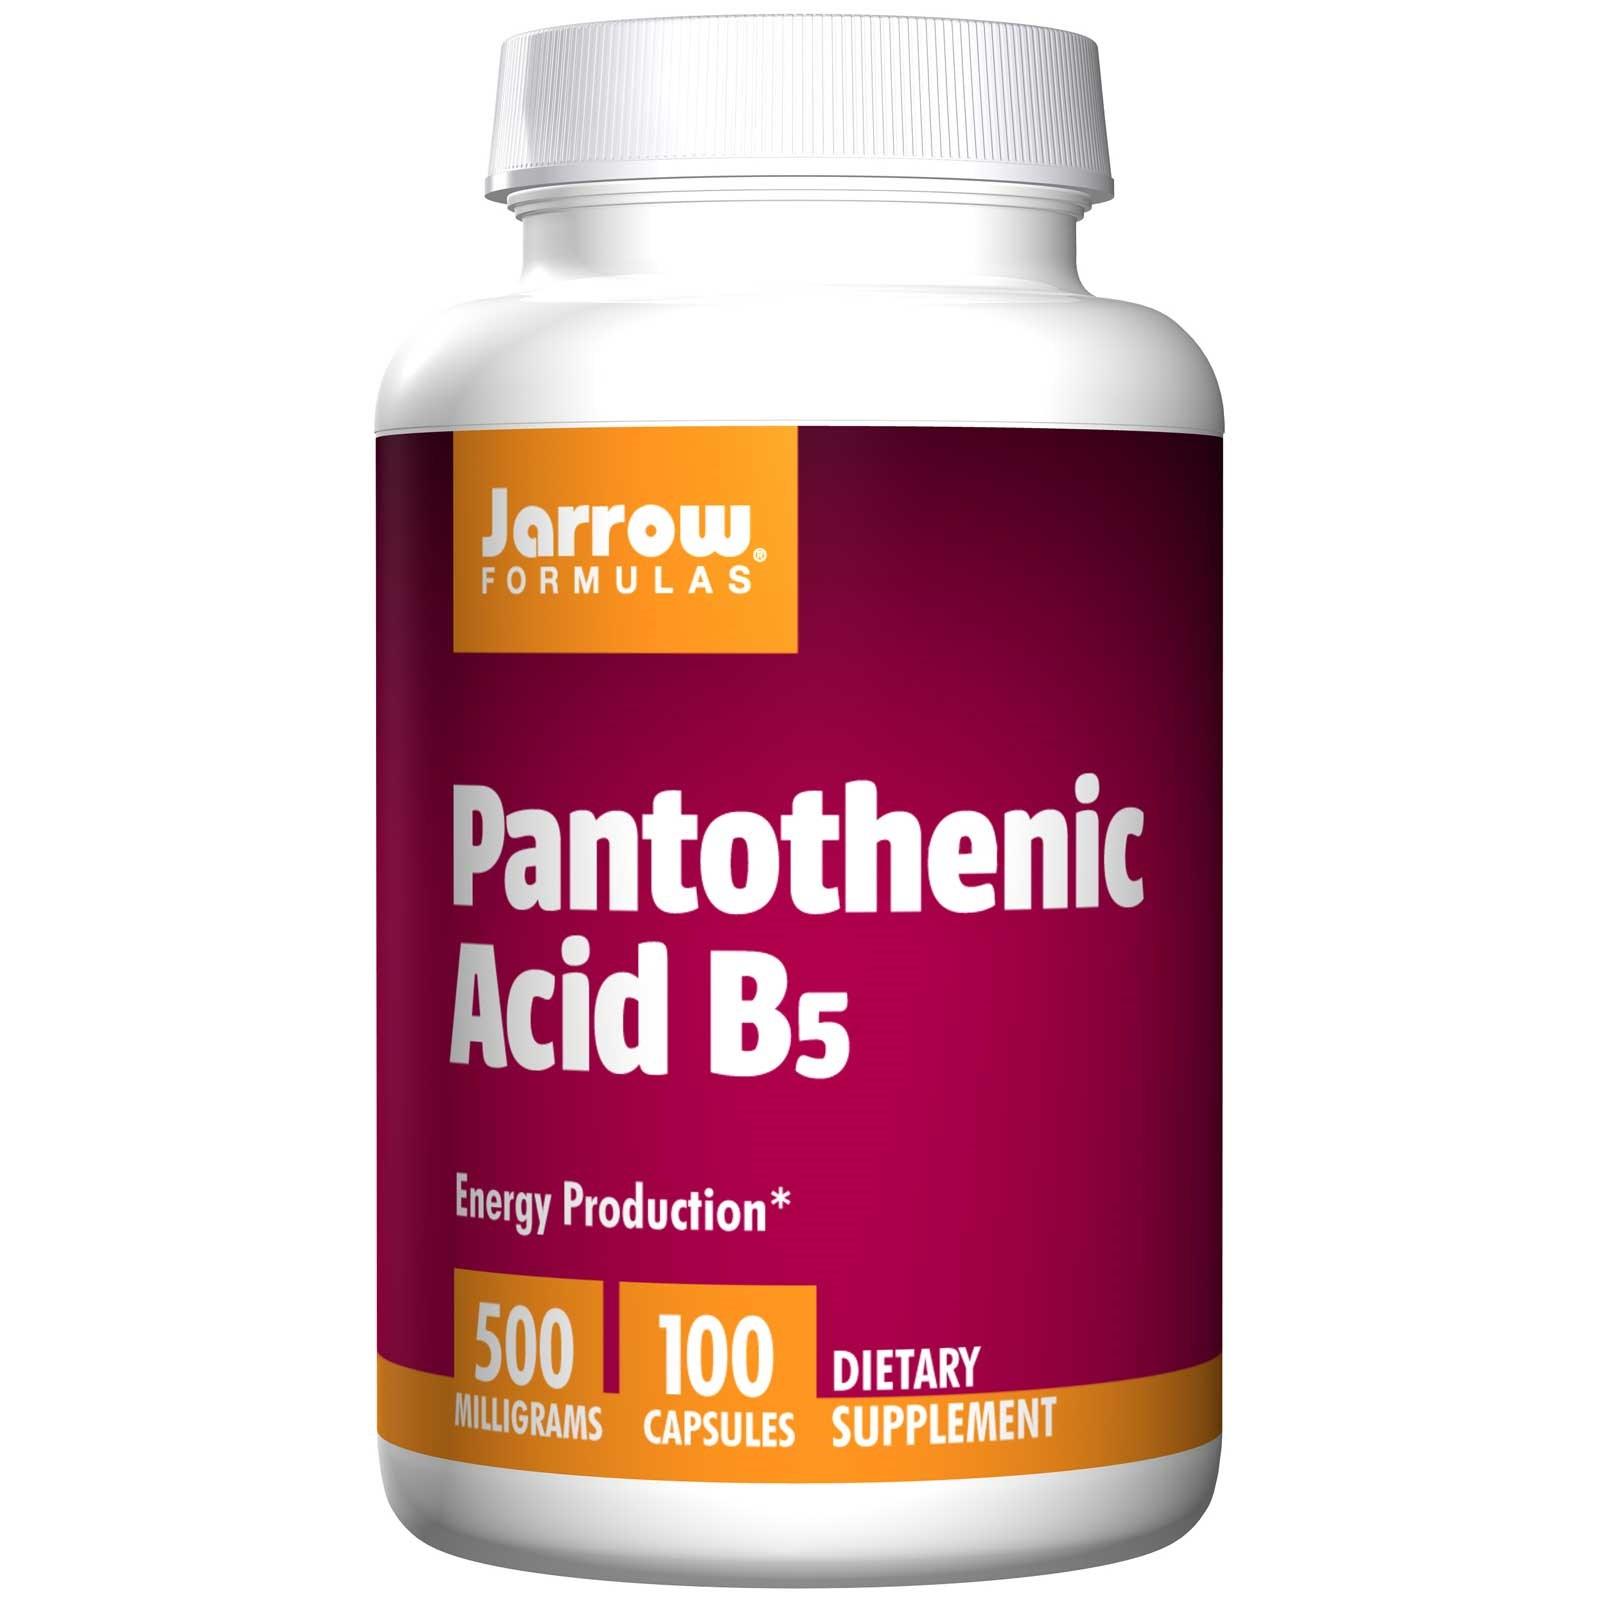 Image of Pantothenic Acid B5 500 mg (100 Capsules) - Jarrow Formulas 0790011180104